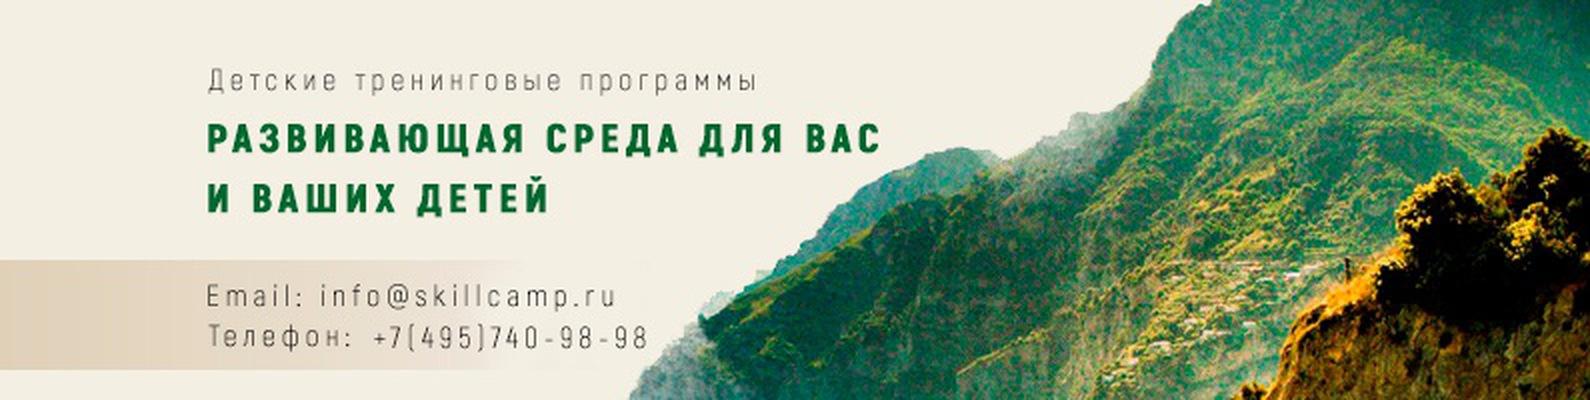 programma-vkontakte-golie-zheni-lesbi-porno